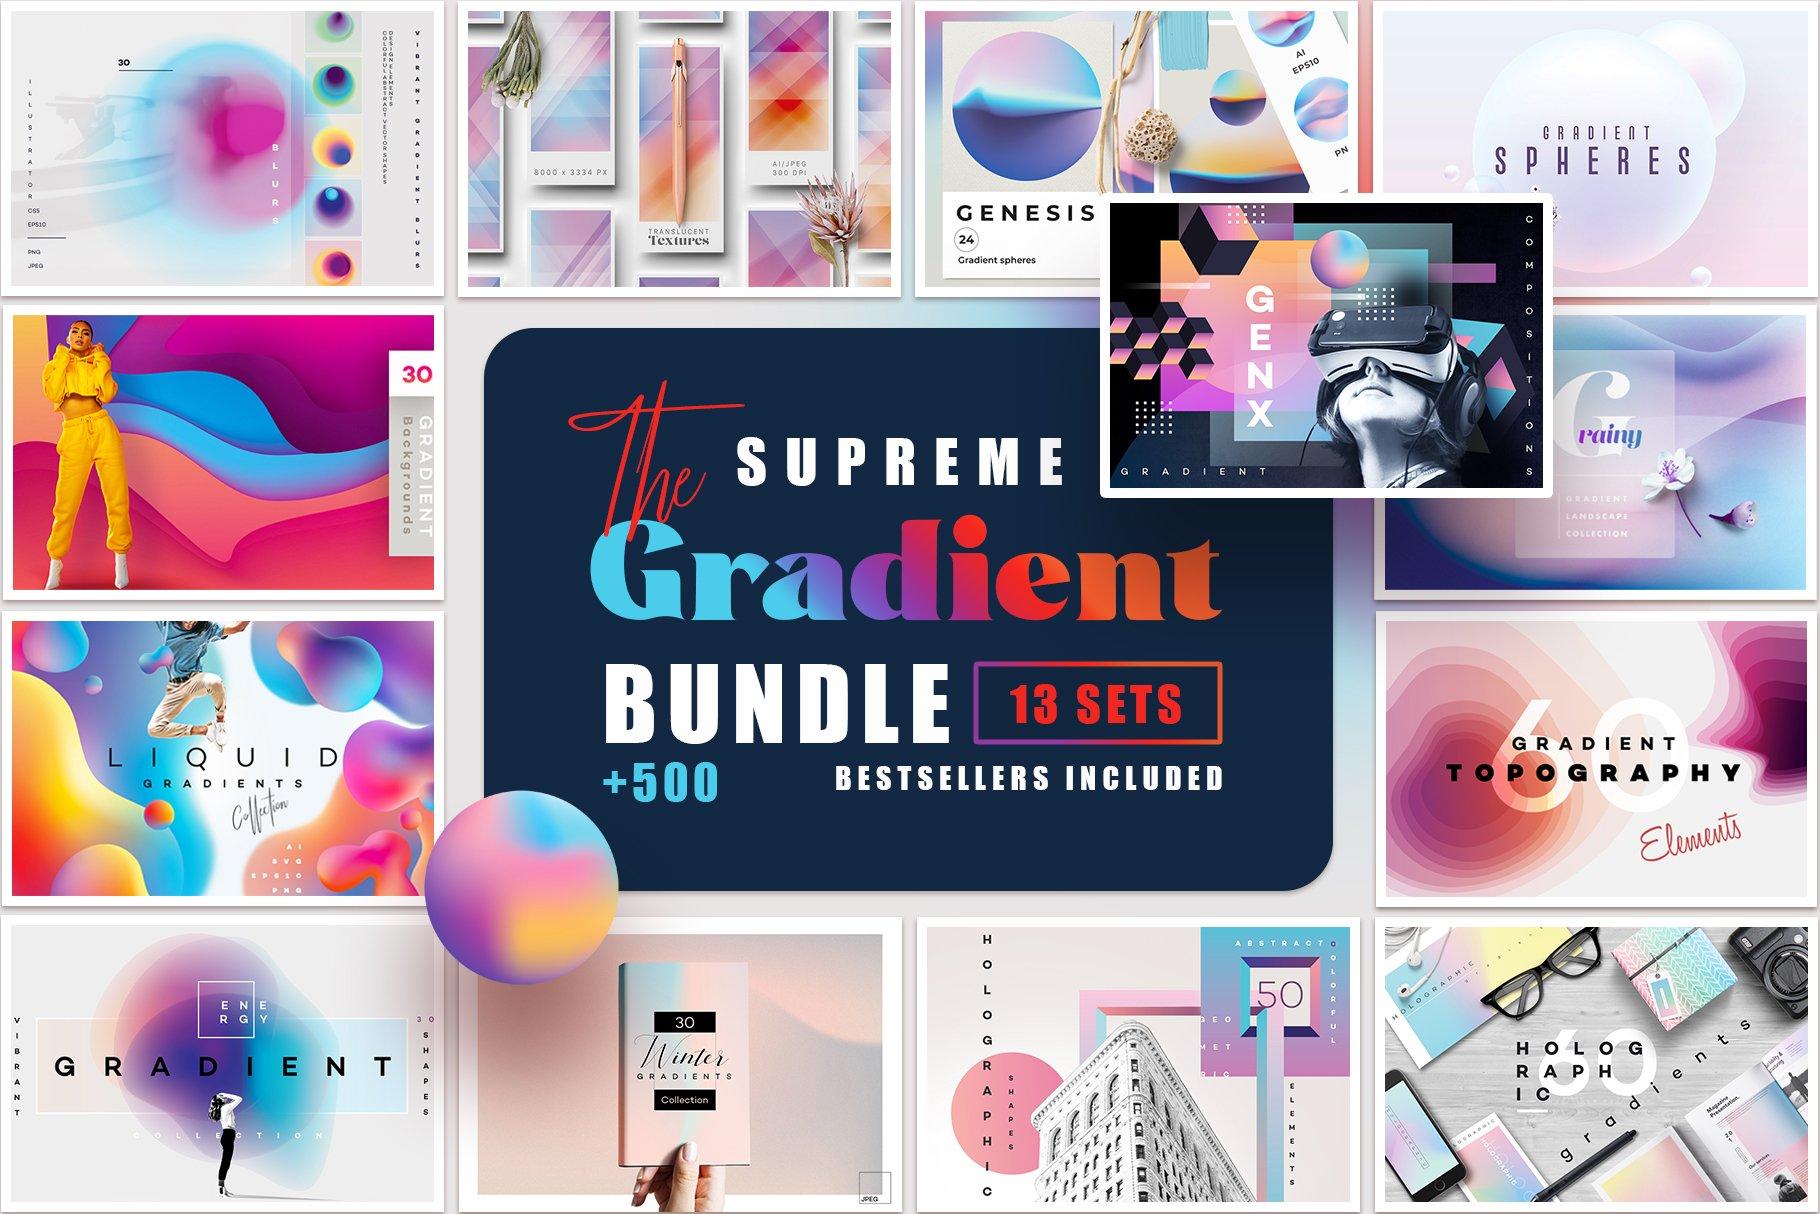 [VIP] The Supreme Gradient Bundle